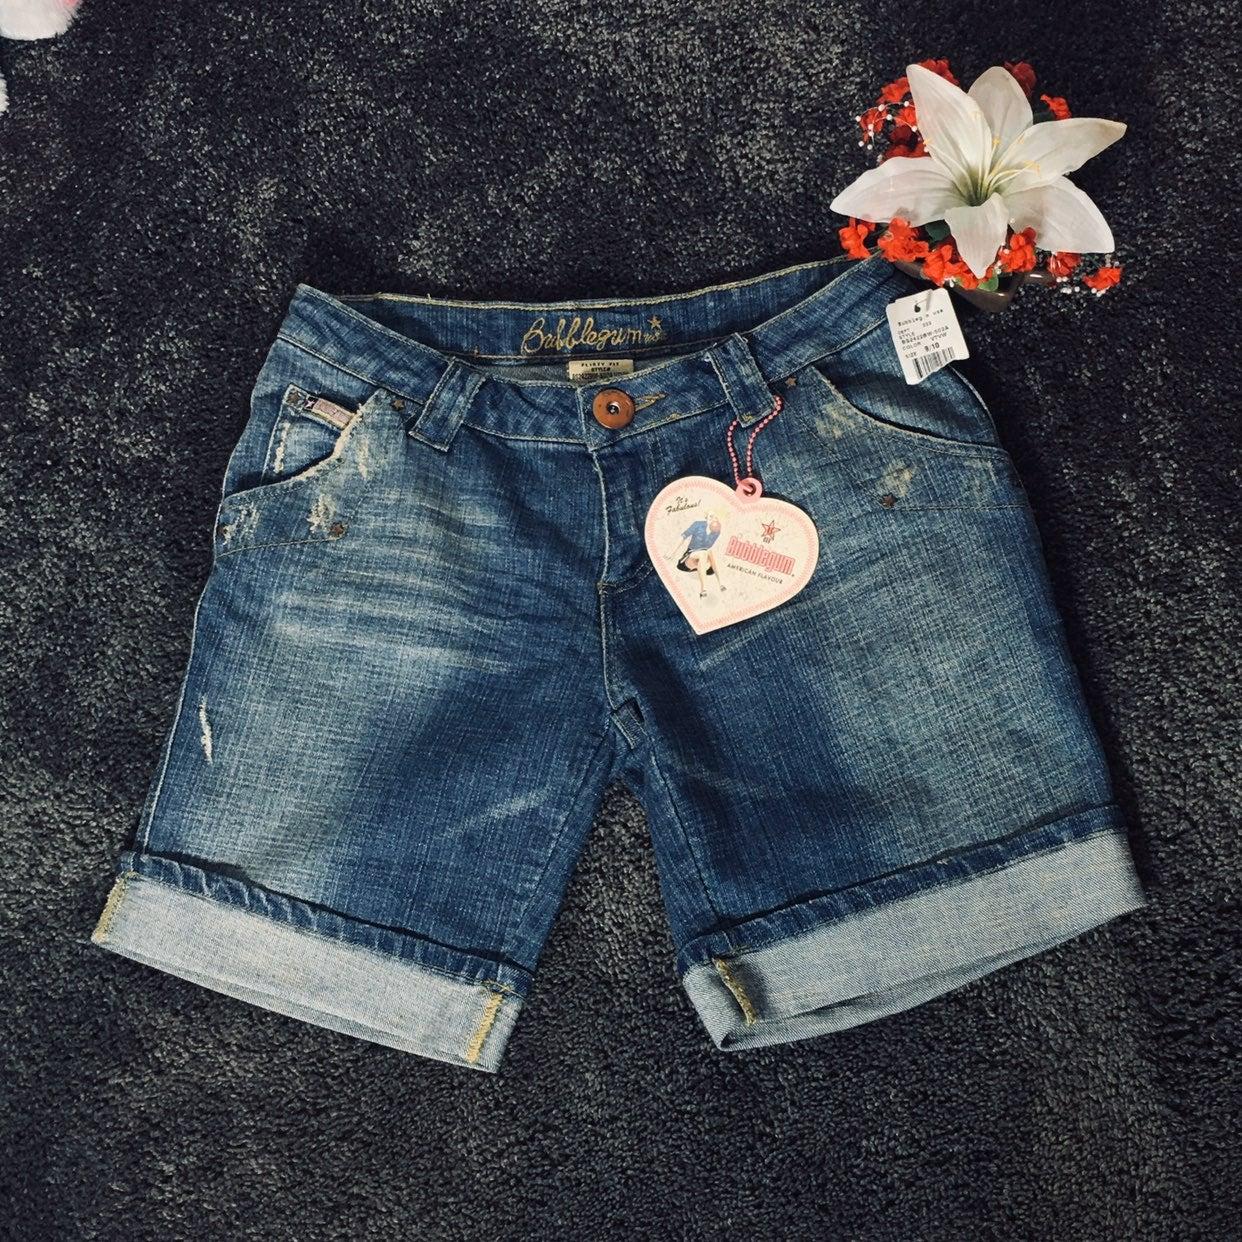 Bubblegum Flirty fit jean shorts